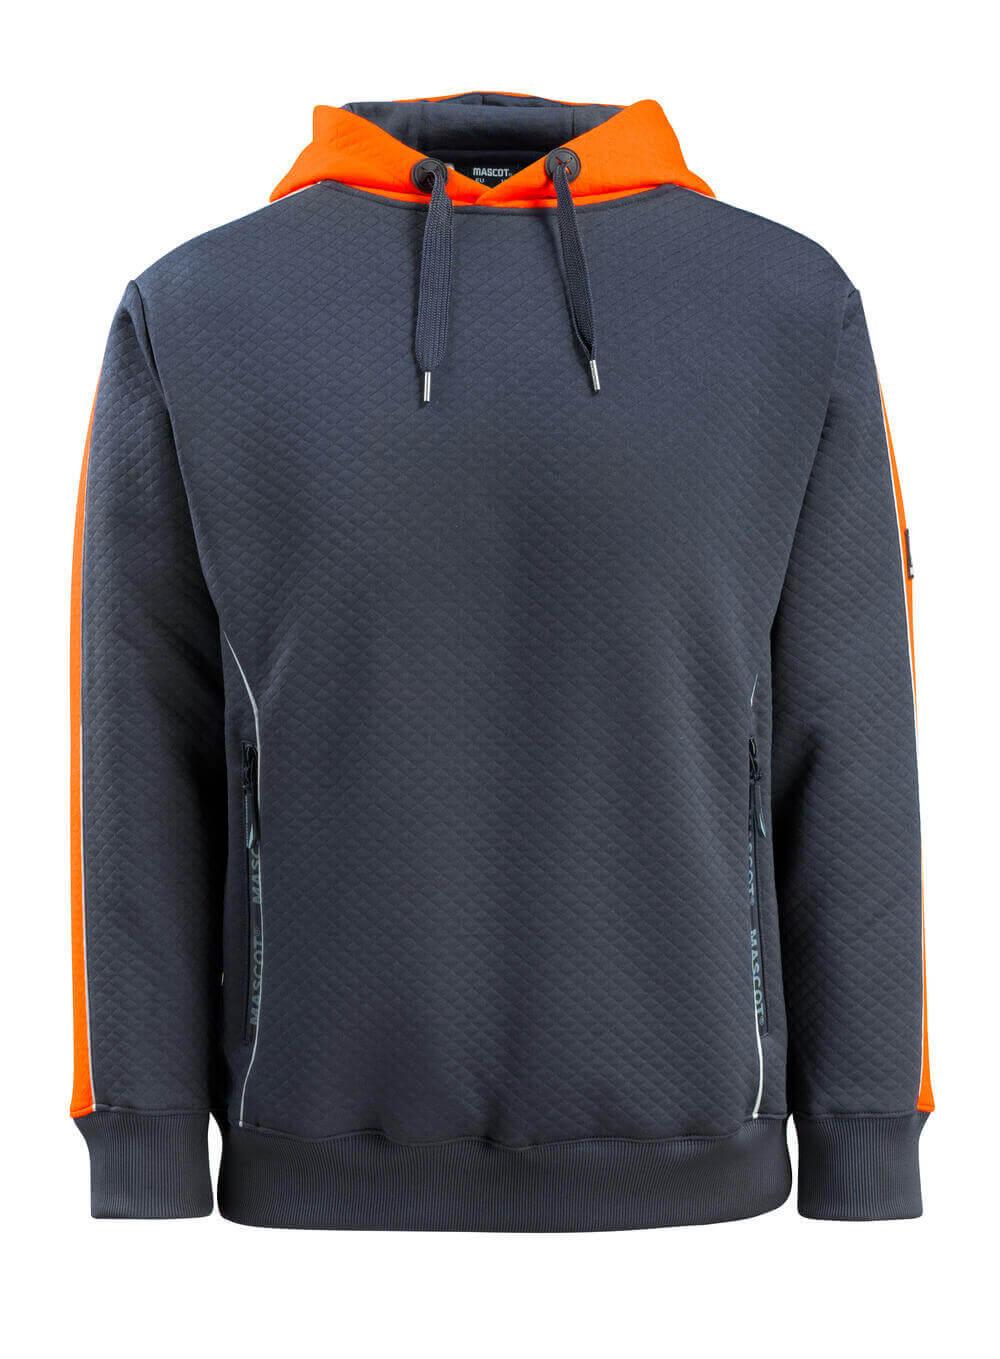 50124-932-01014 Kapuzensweatshirt - Schwarzblau/hi-vis Orange